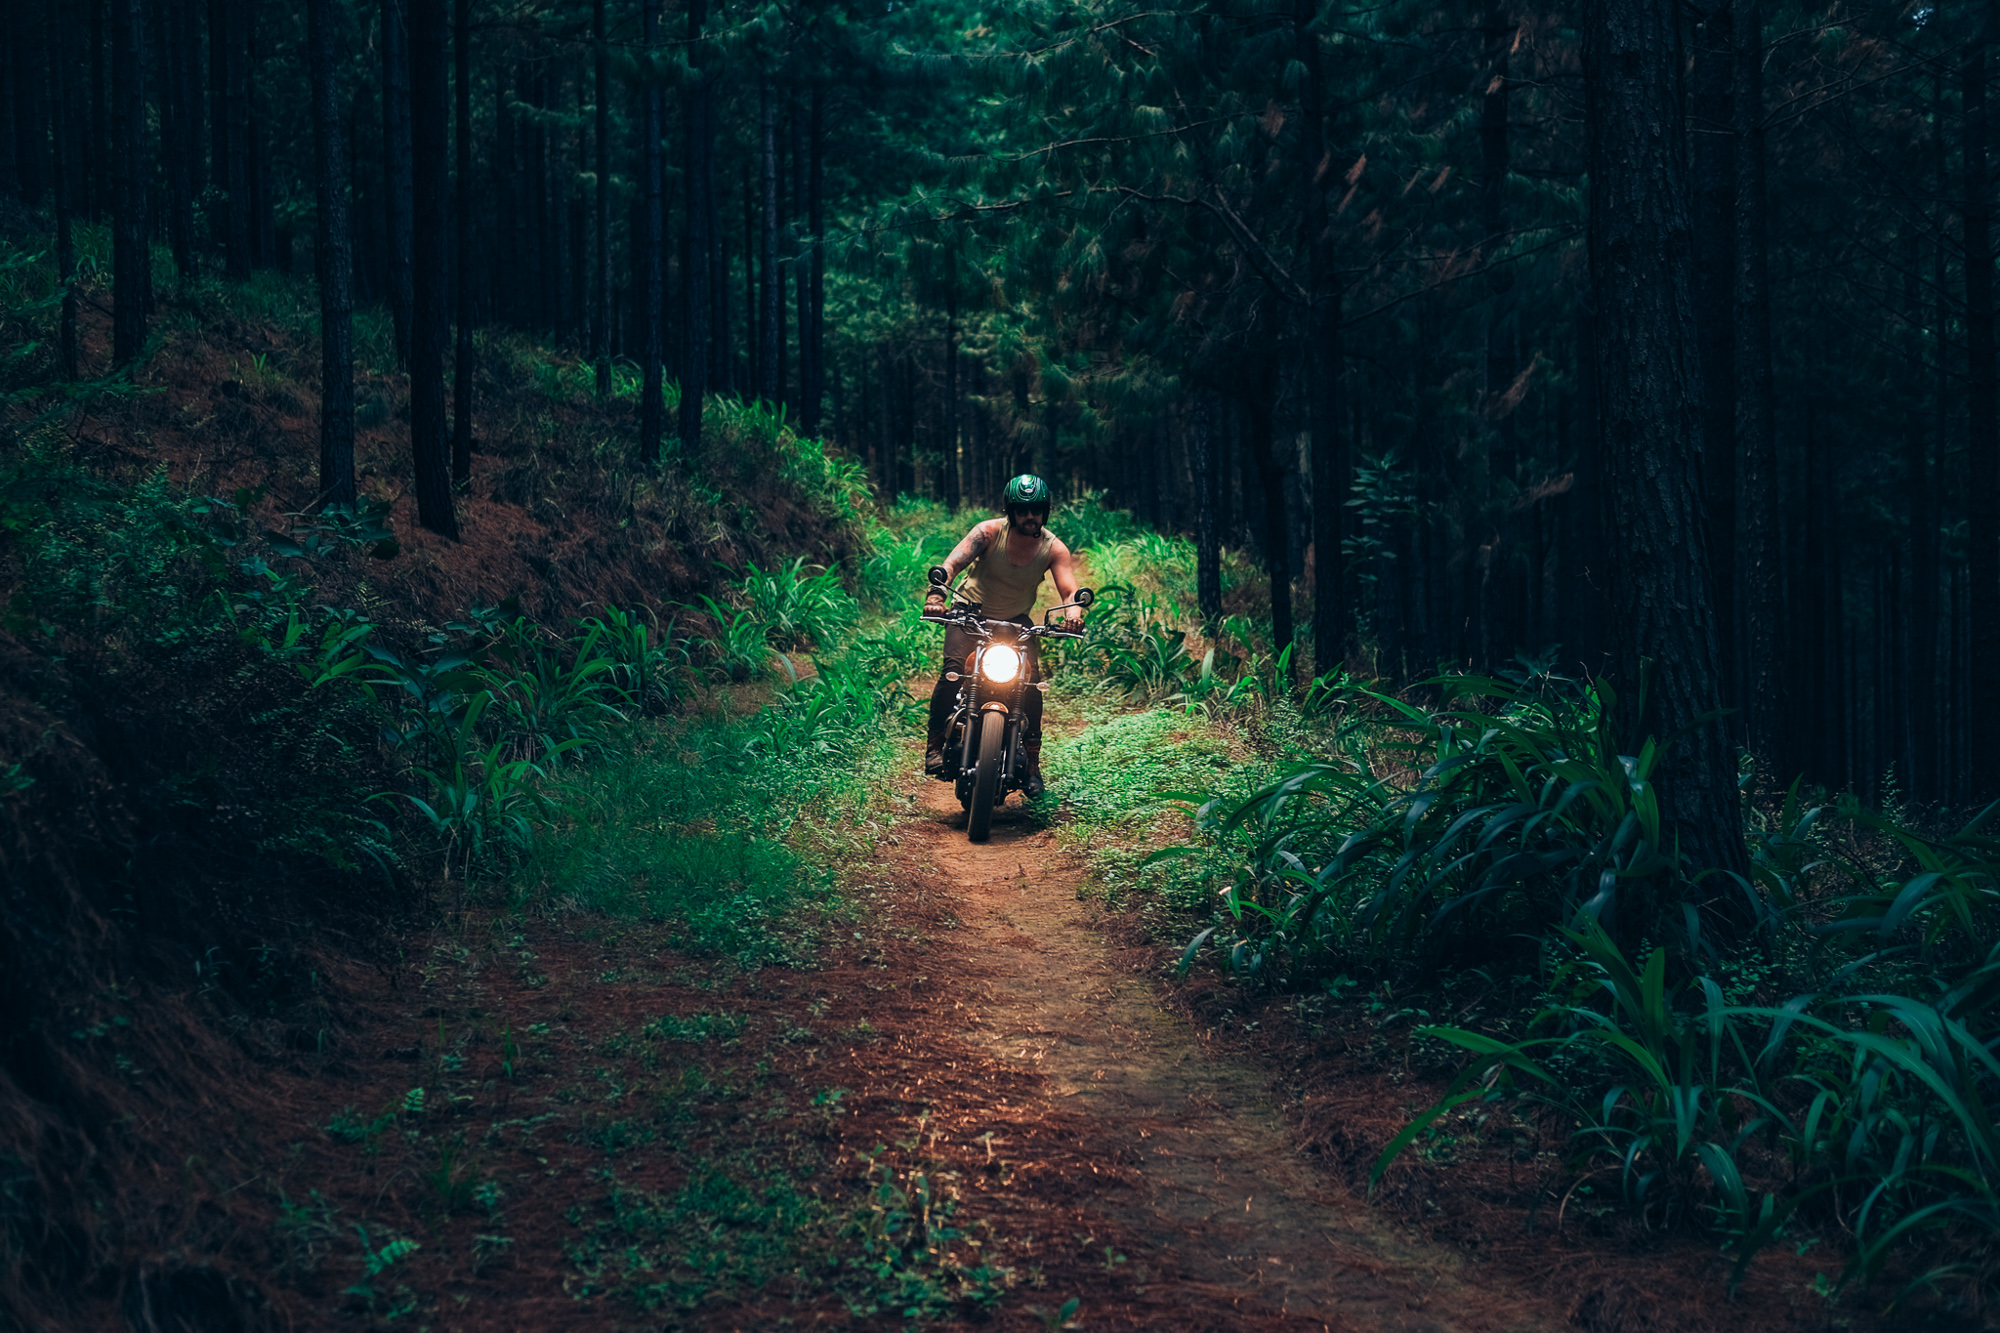 sabie bubble run forest ride